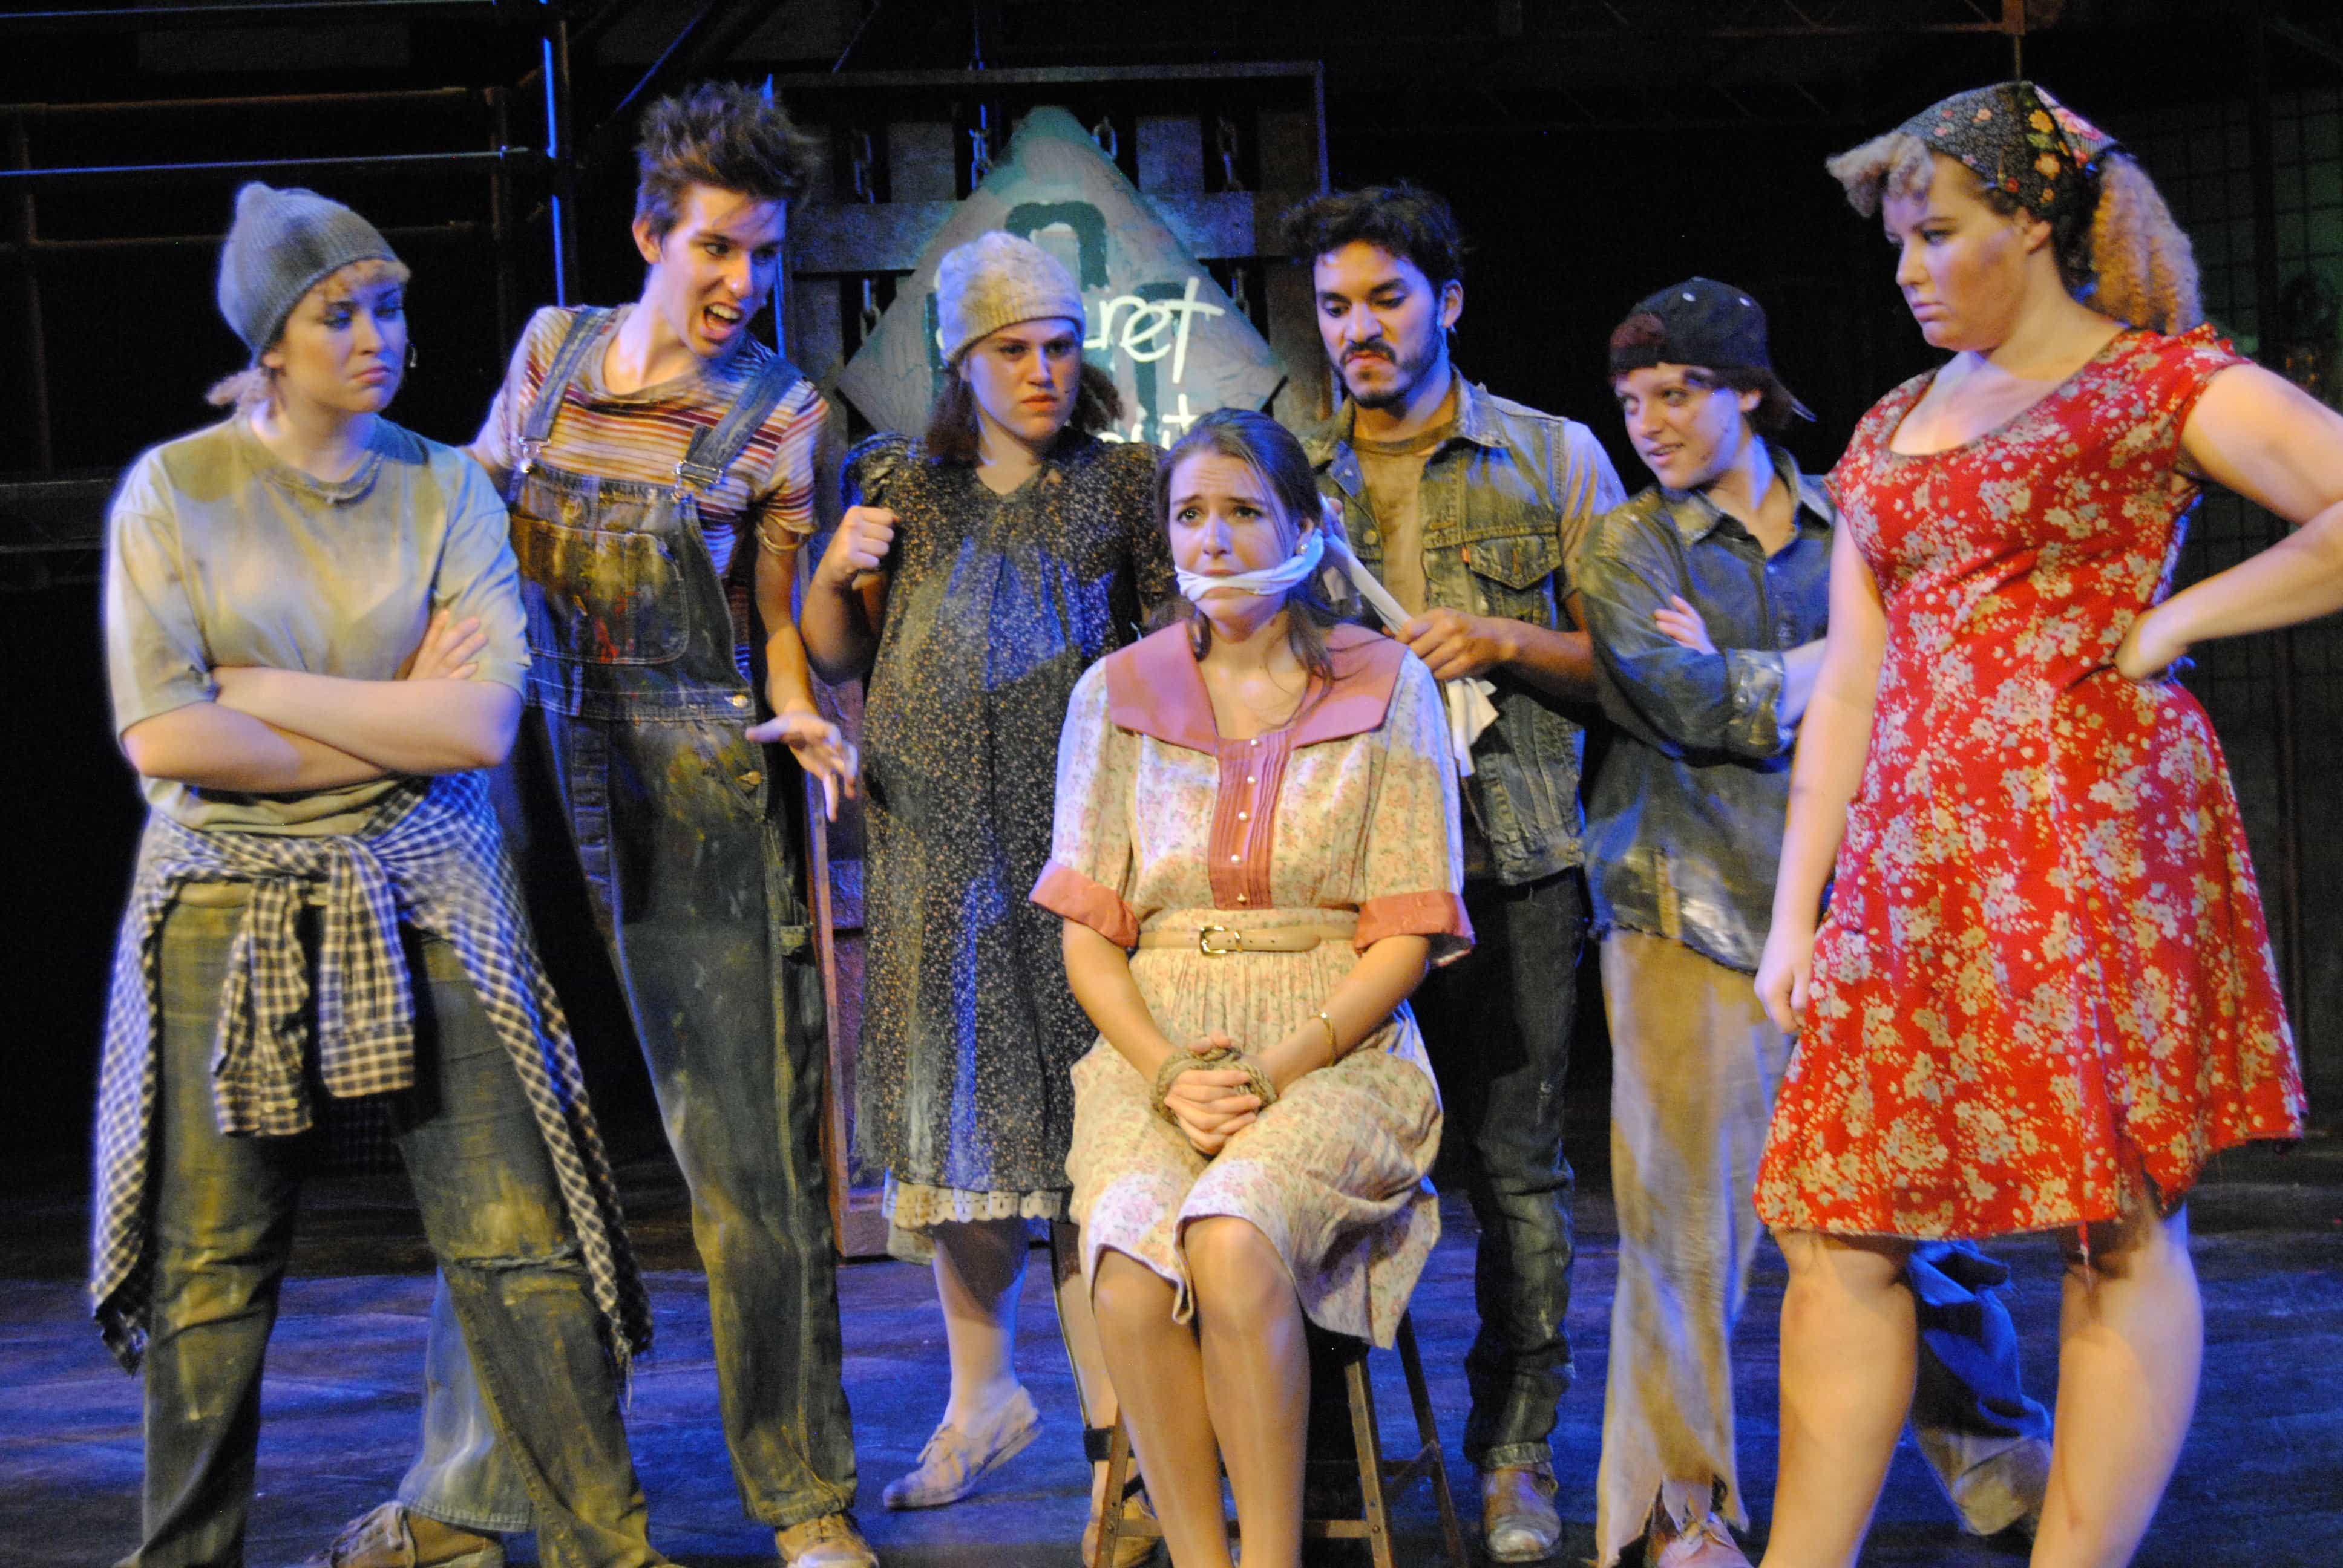 The cast of 'Urinetown the Musical.' Photo credit: William Atkins, Senior University Photographer.